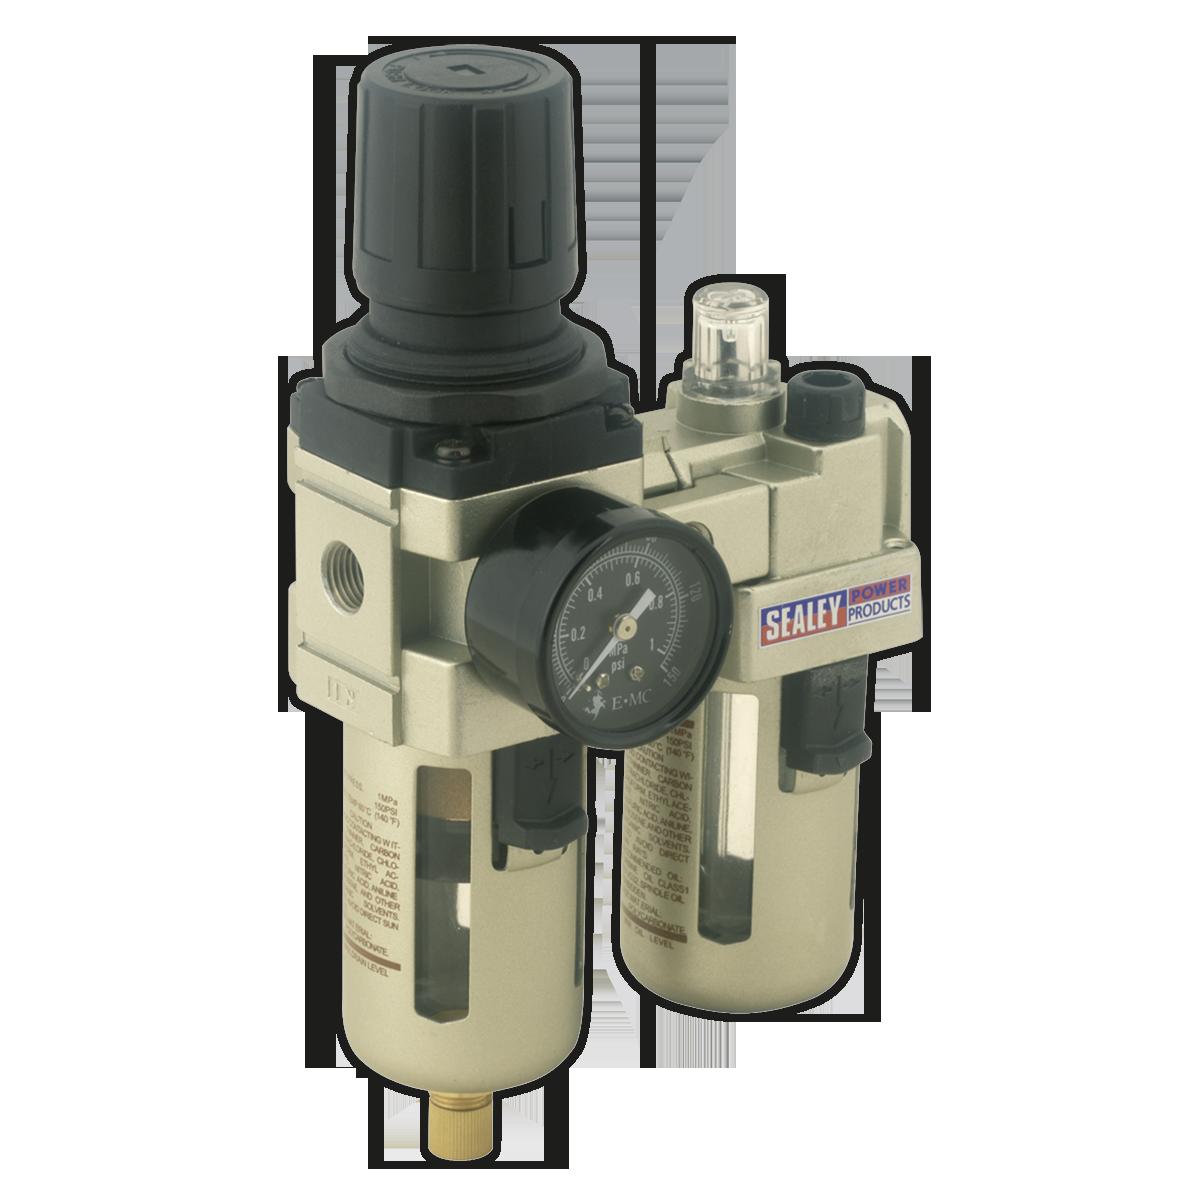 Air Filter/Regulator/Lubricator Max Airflow 60cfm